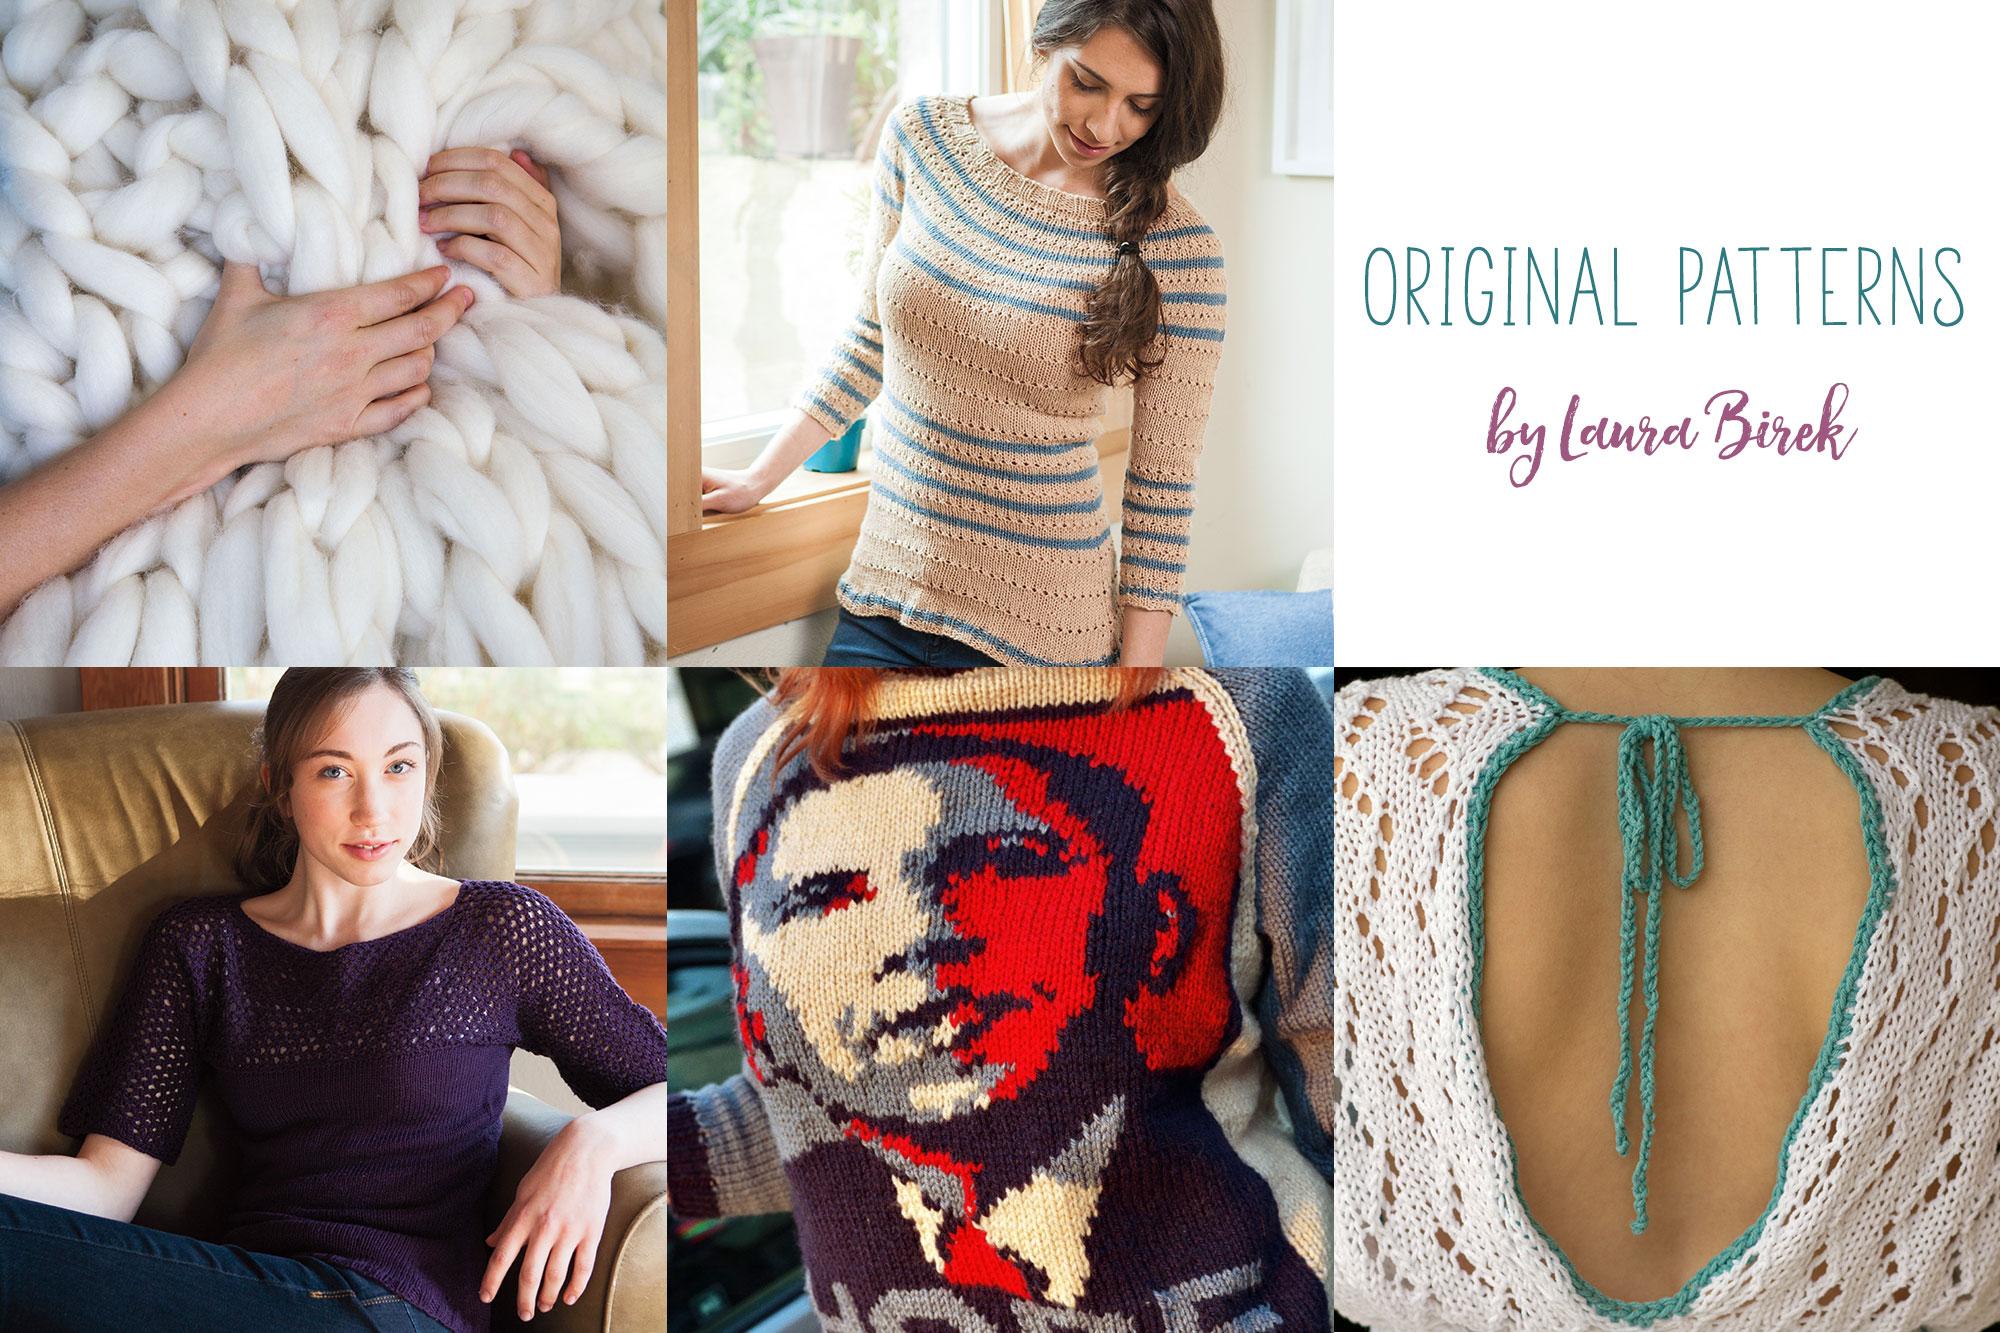 Original Patterns by Laura Birek